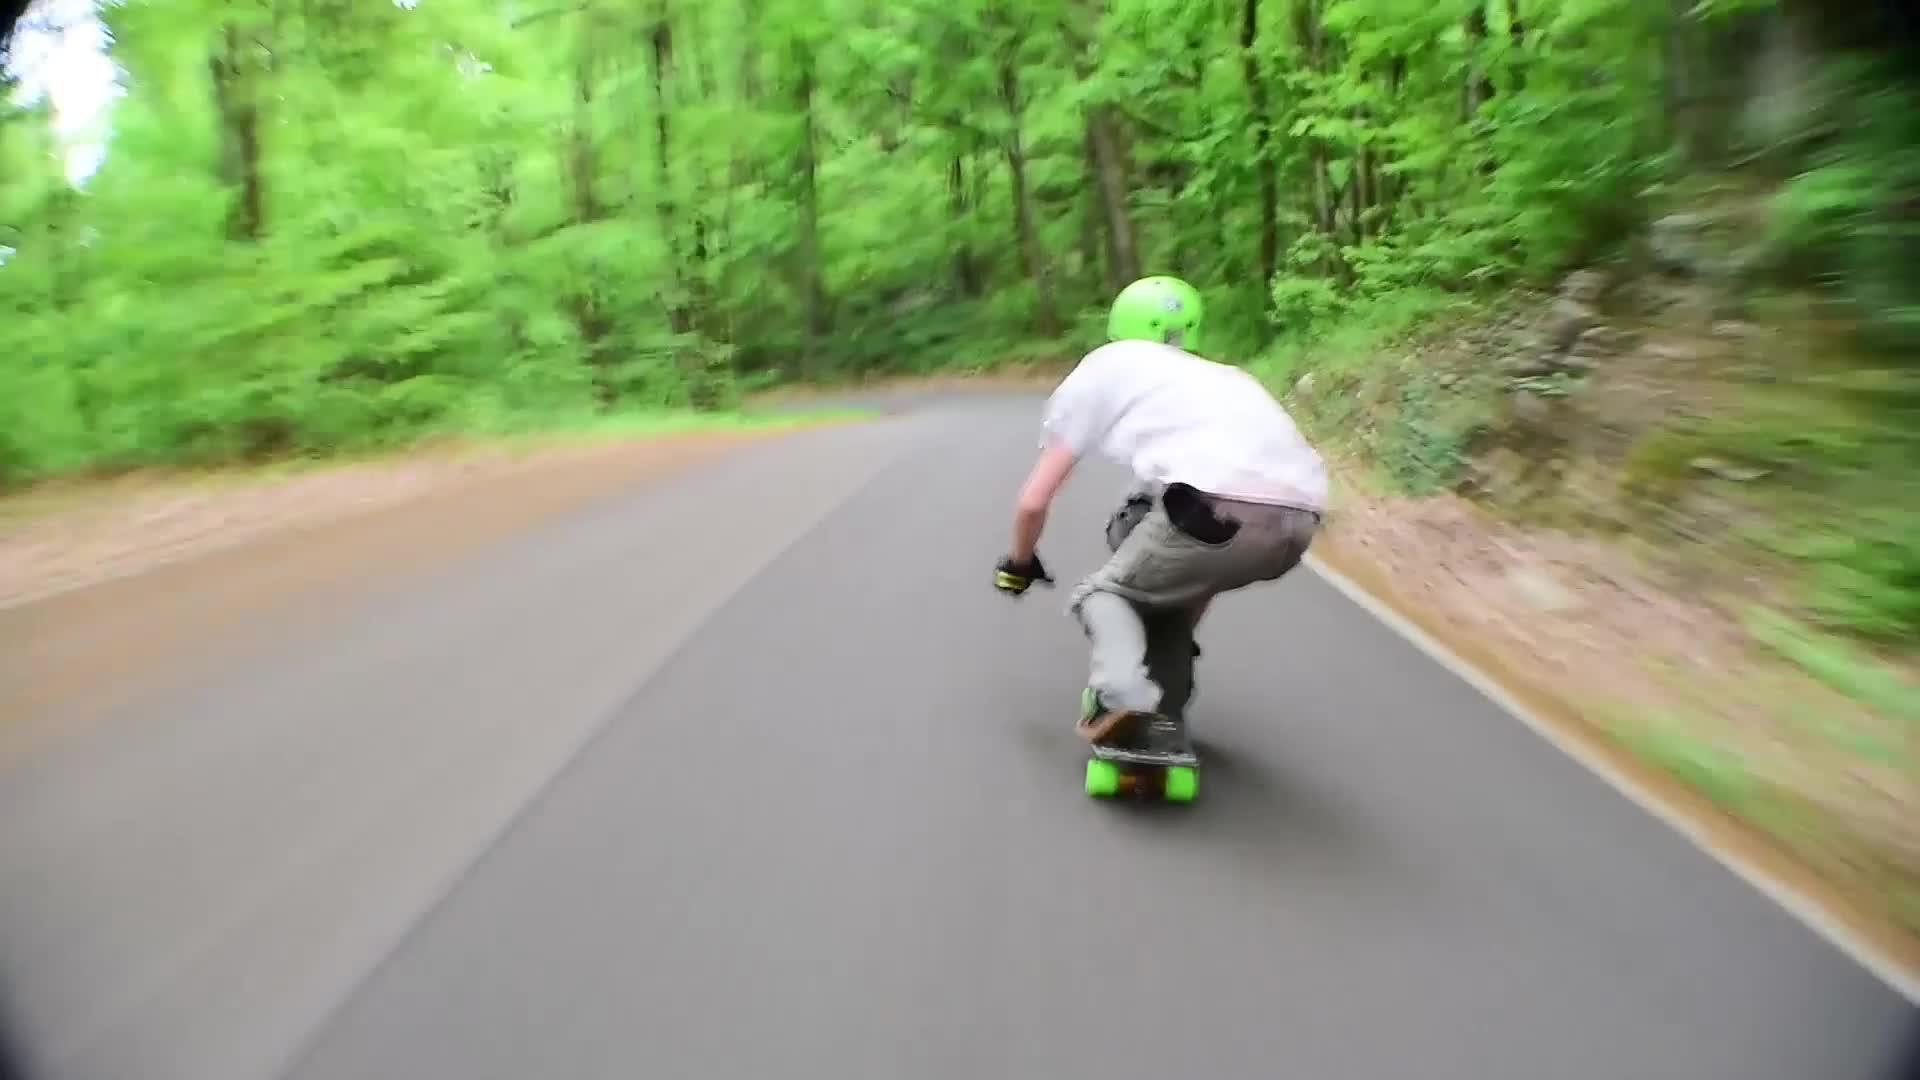 longboarding, skateboard, skateboarding, ThreeSix Mini @ BFG GIFs